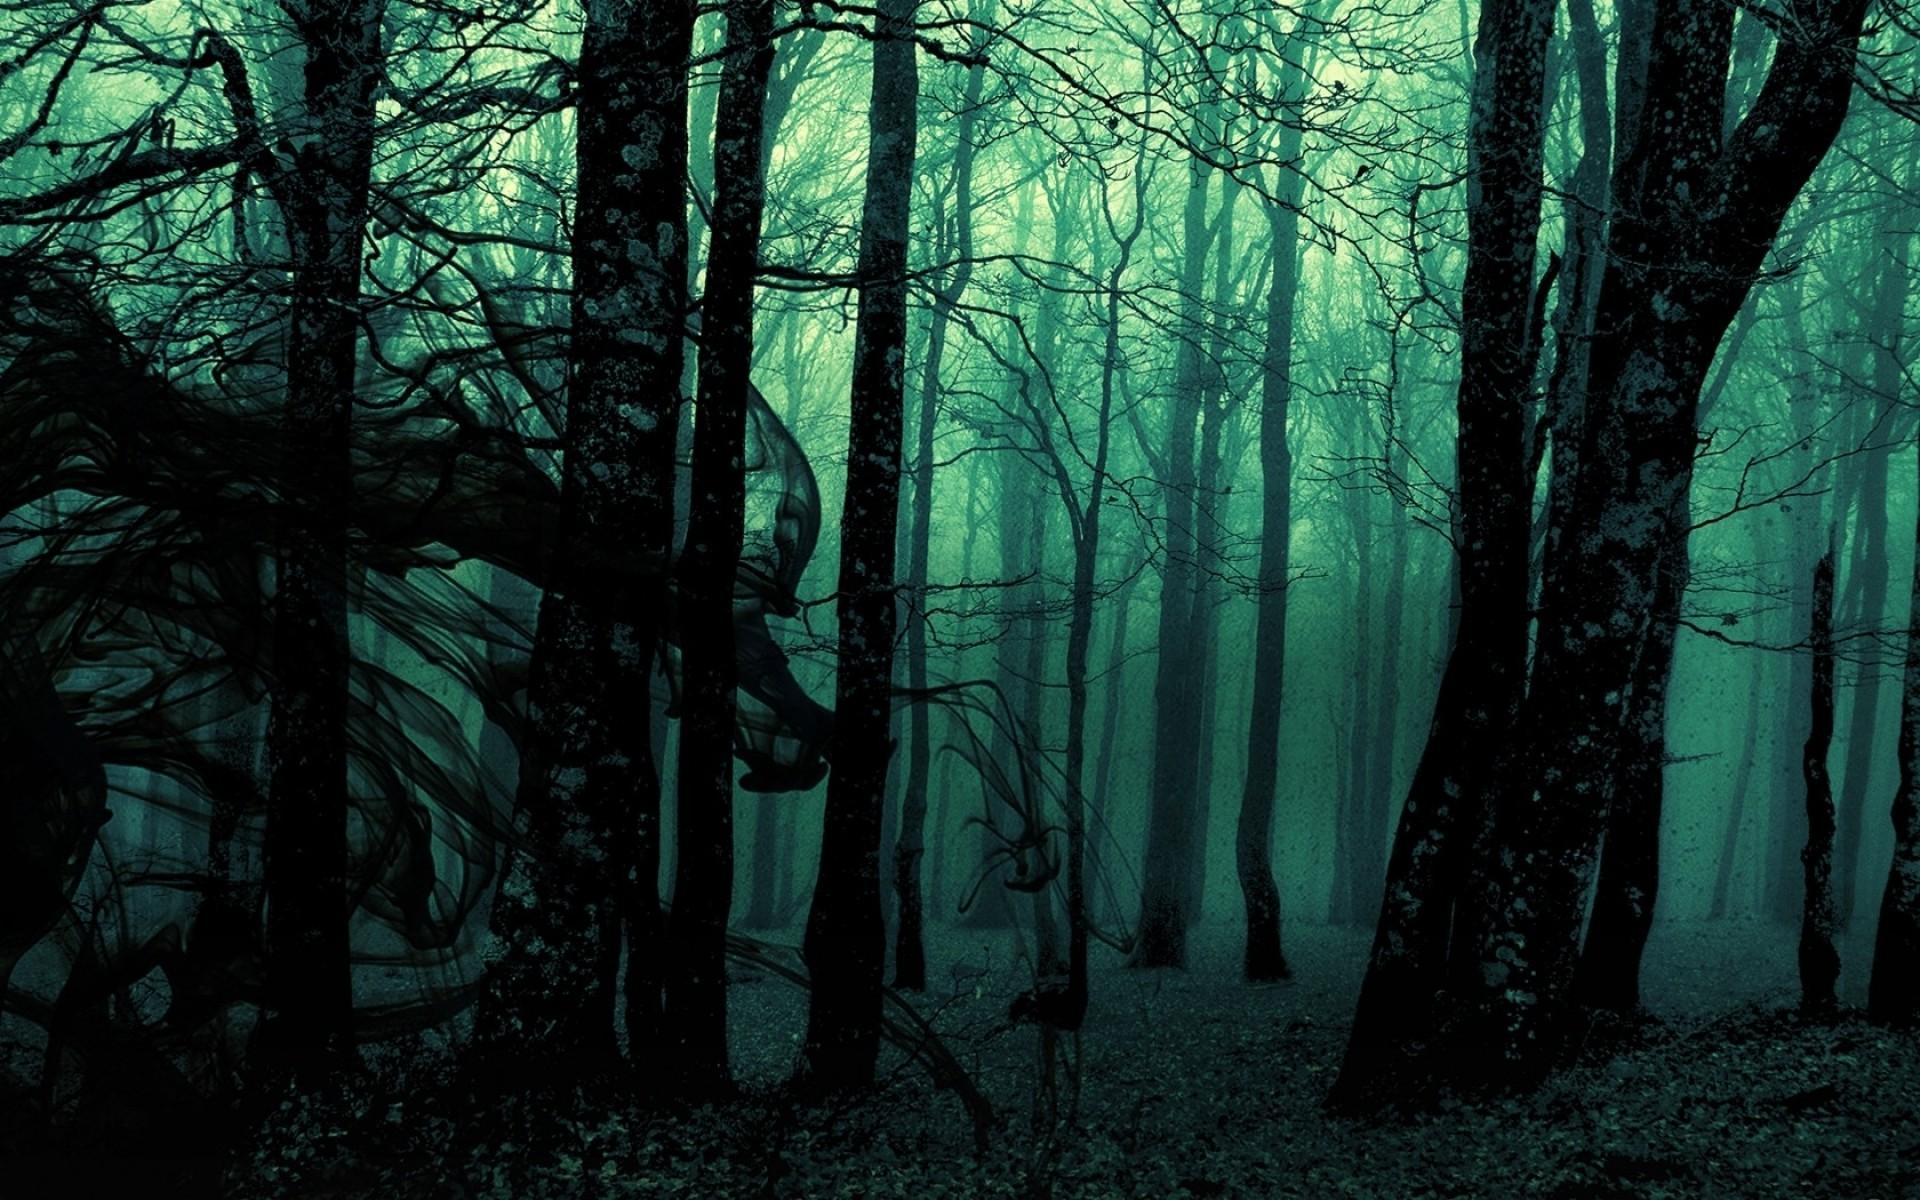 Gloomy Fall Wallpaper Forest Landscape Dark Nature Trees Photo Manipulation